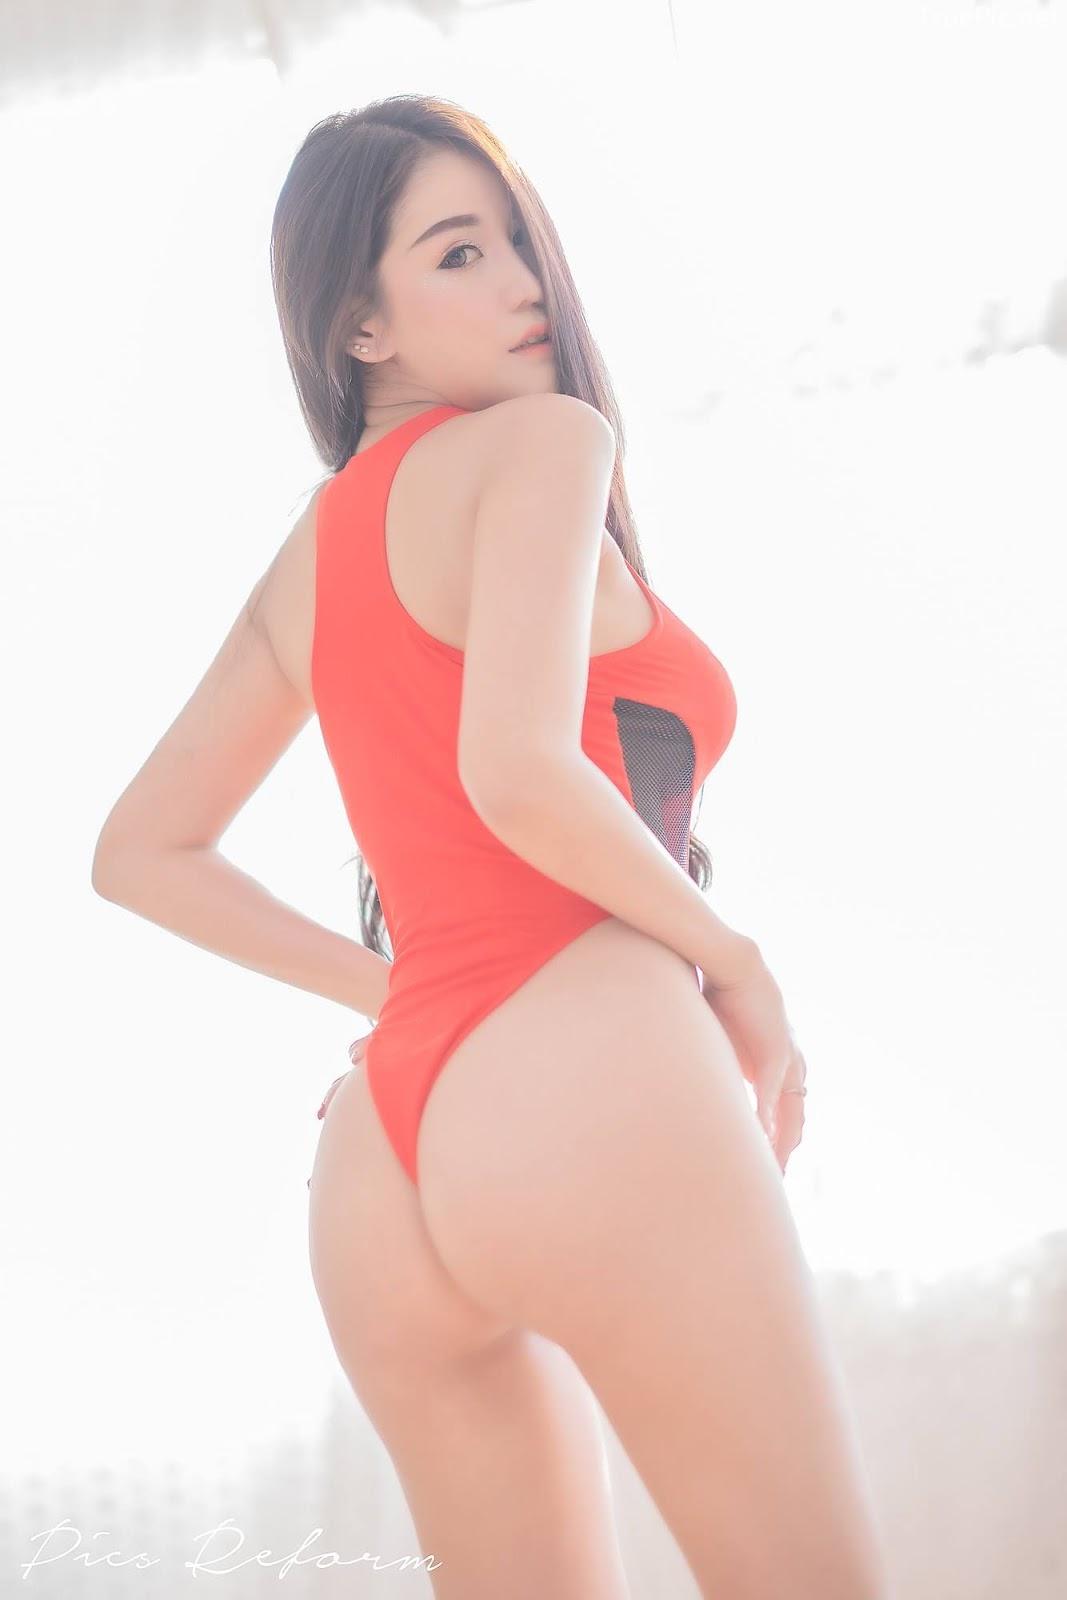 Thailand Sexy Model - Prapatsara Kongpanus - Red Army - TruePic.net - Picture 4